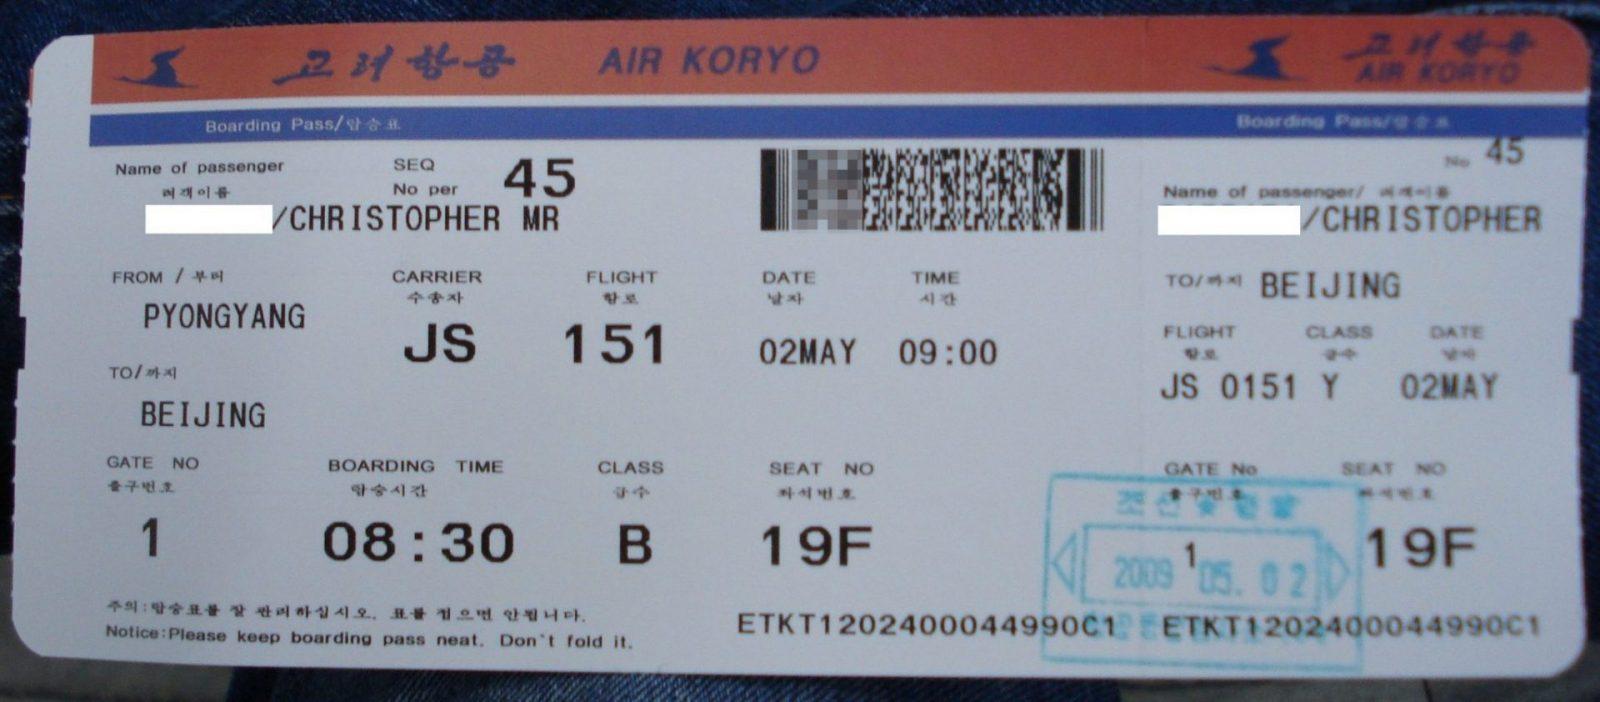 5 Ways to Avoiding Identity Theft When Traveling